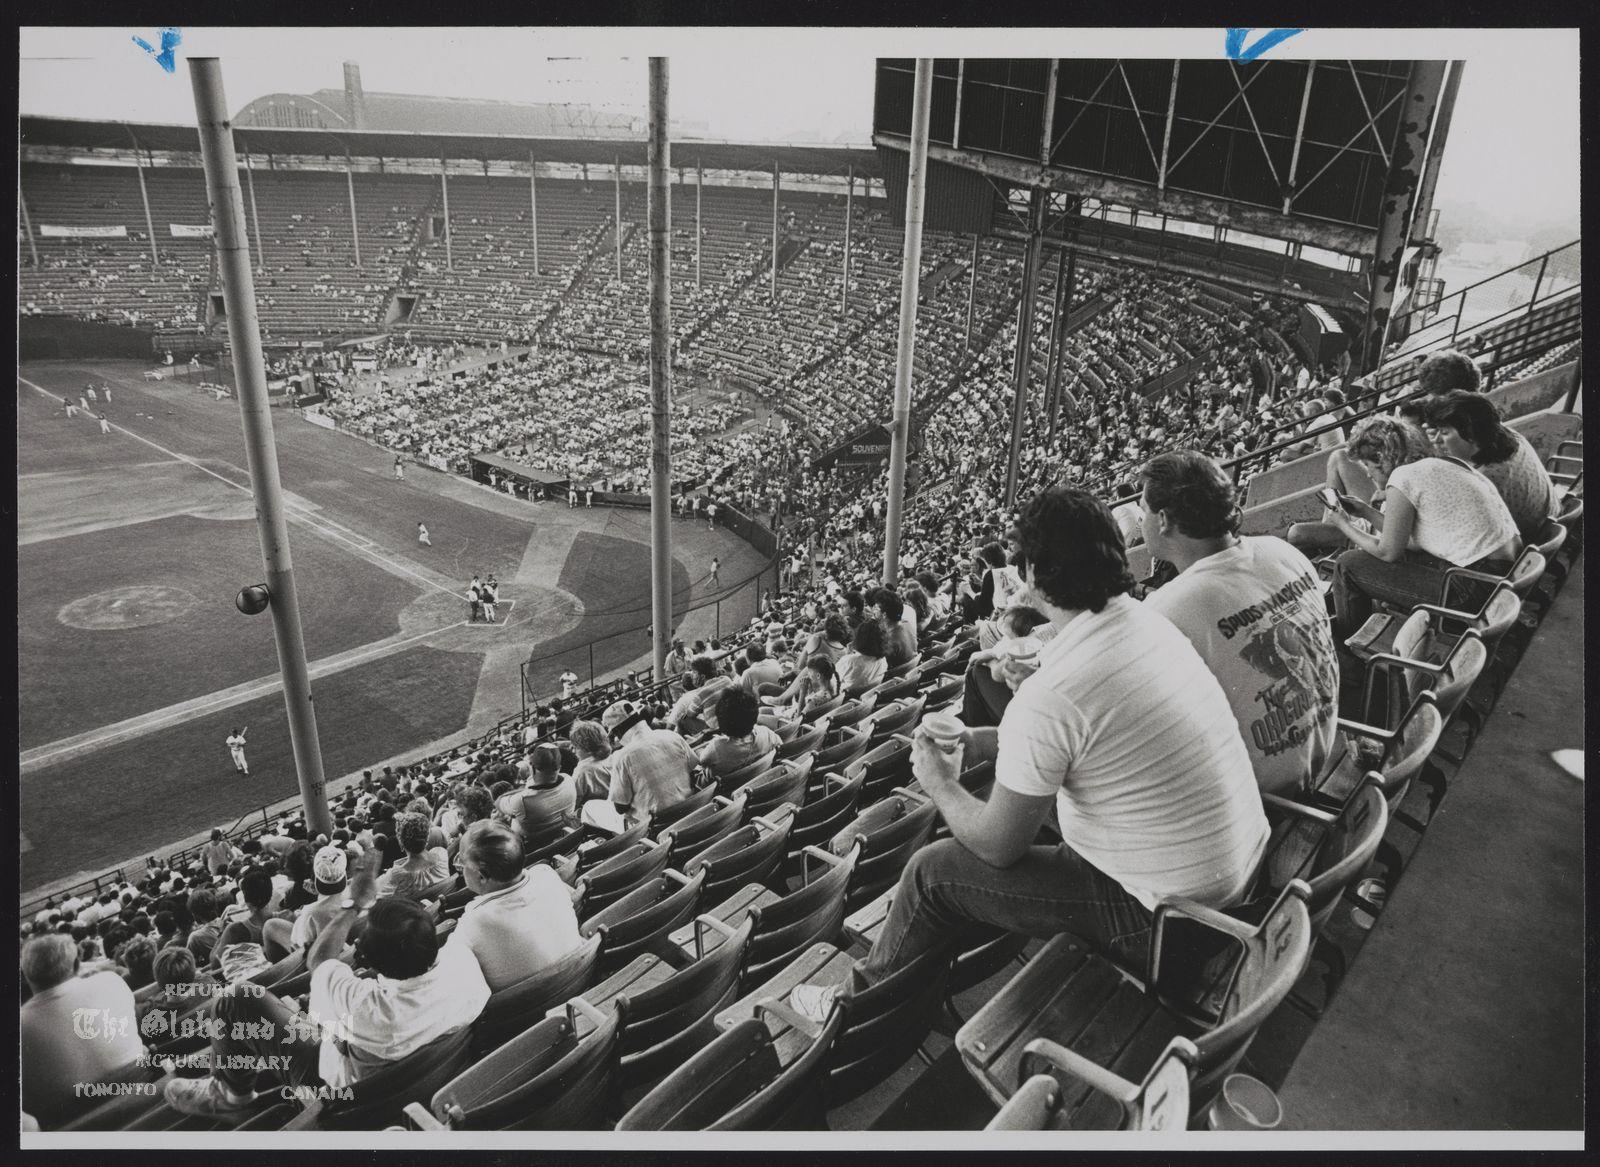 WAR MEMORIAL STADIUM (Buffalo) Buffalo baseball fans gather at War Memorial Stadium (Old Rockpile) yesterday to watch Bisons play Nashville Sounds in American Association game.